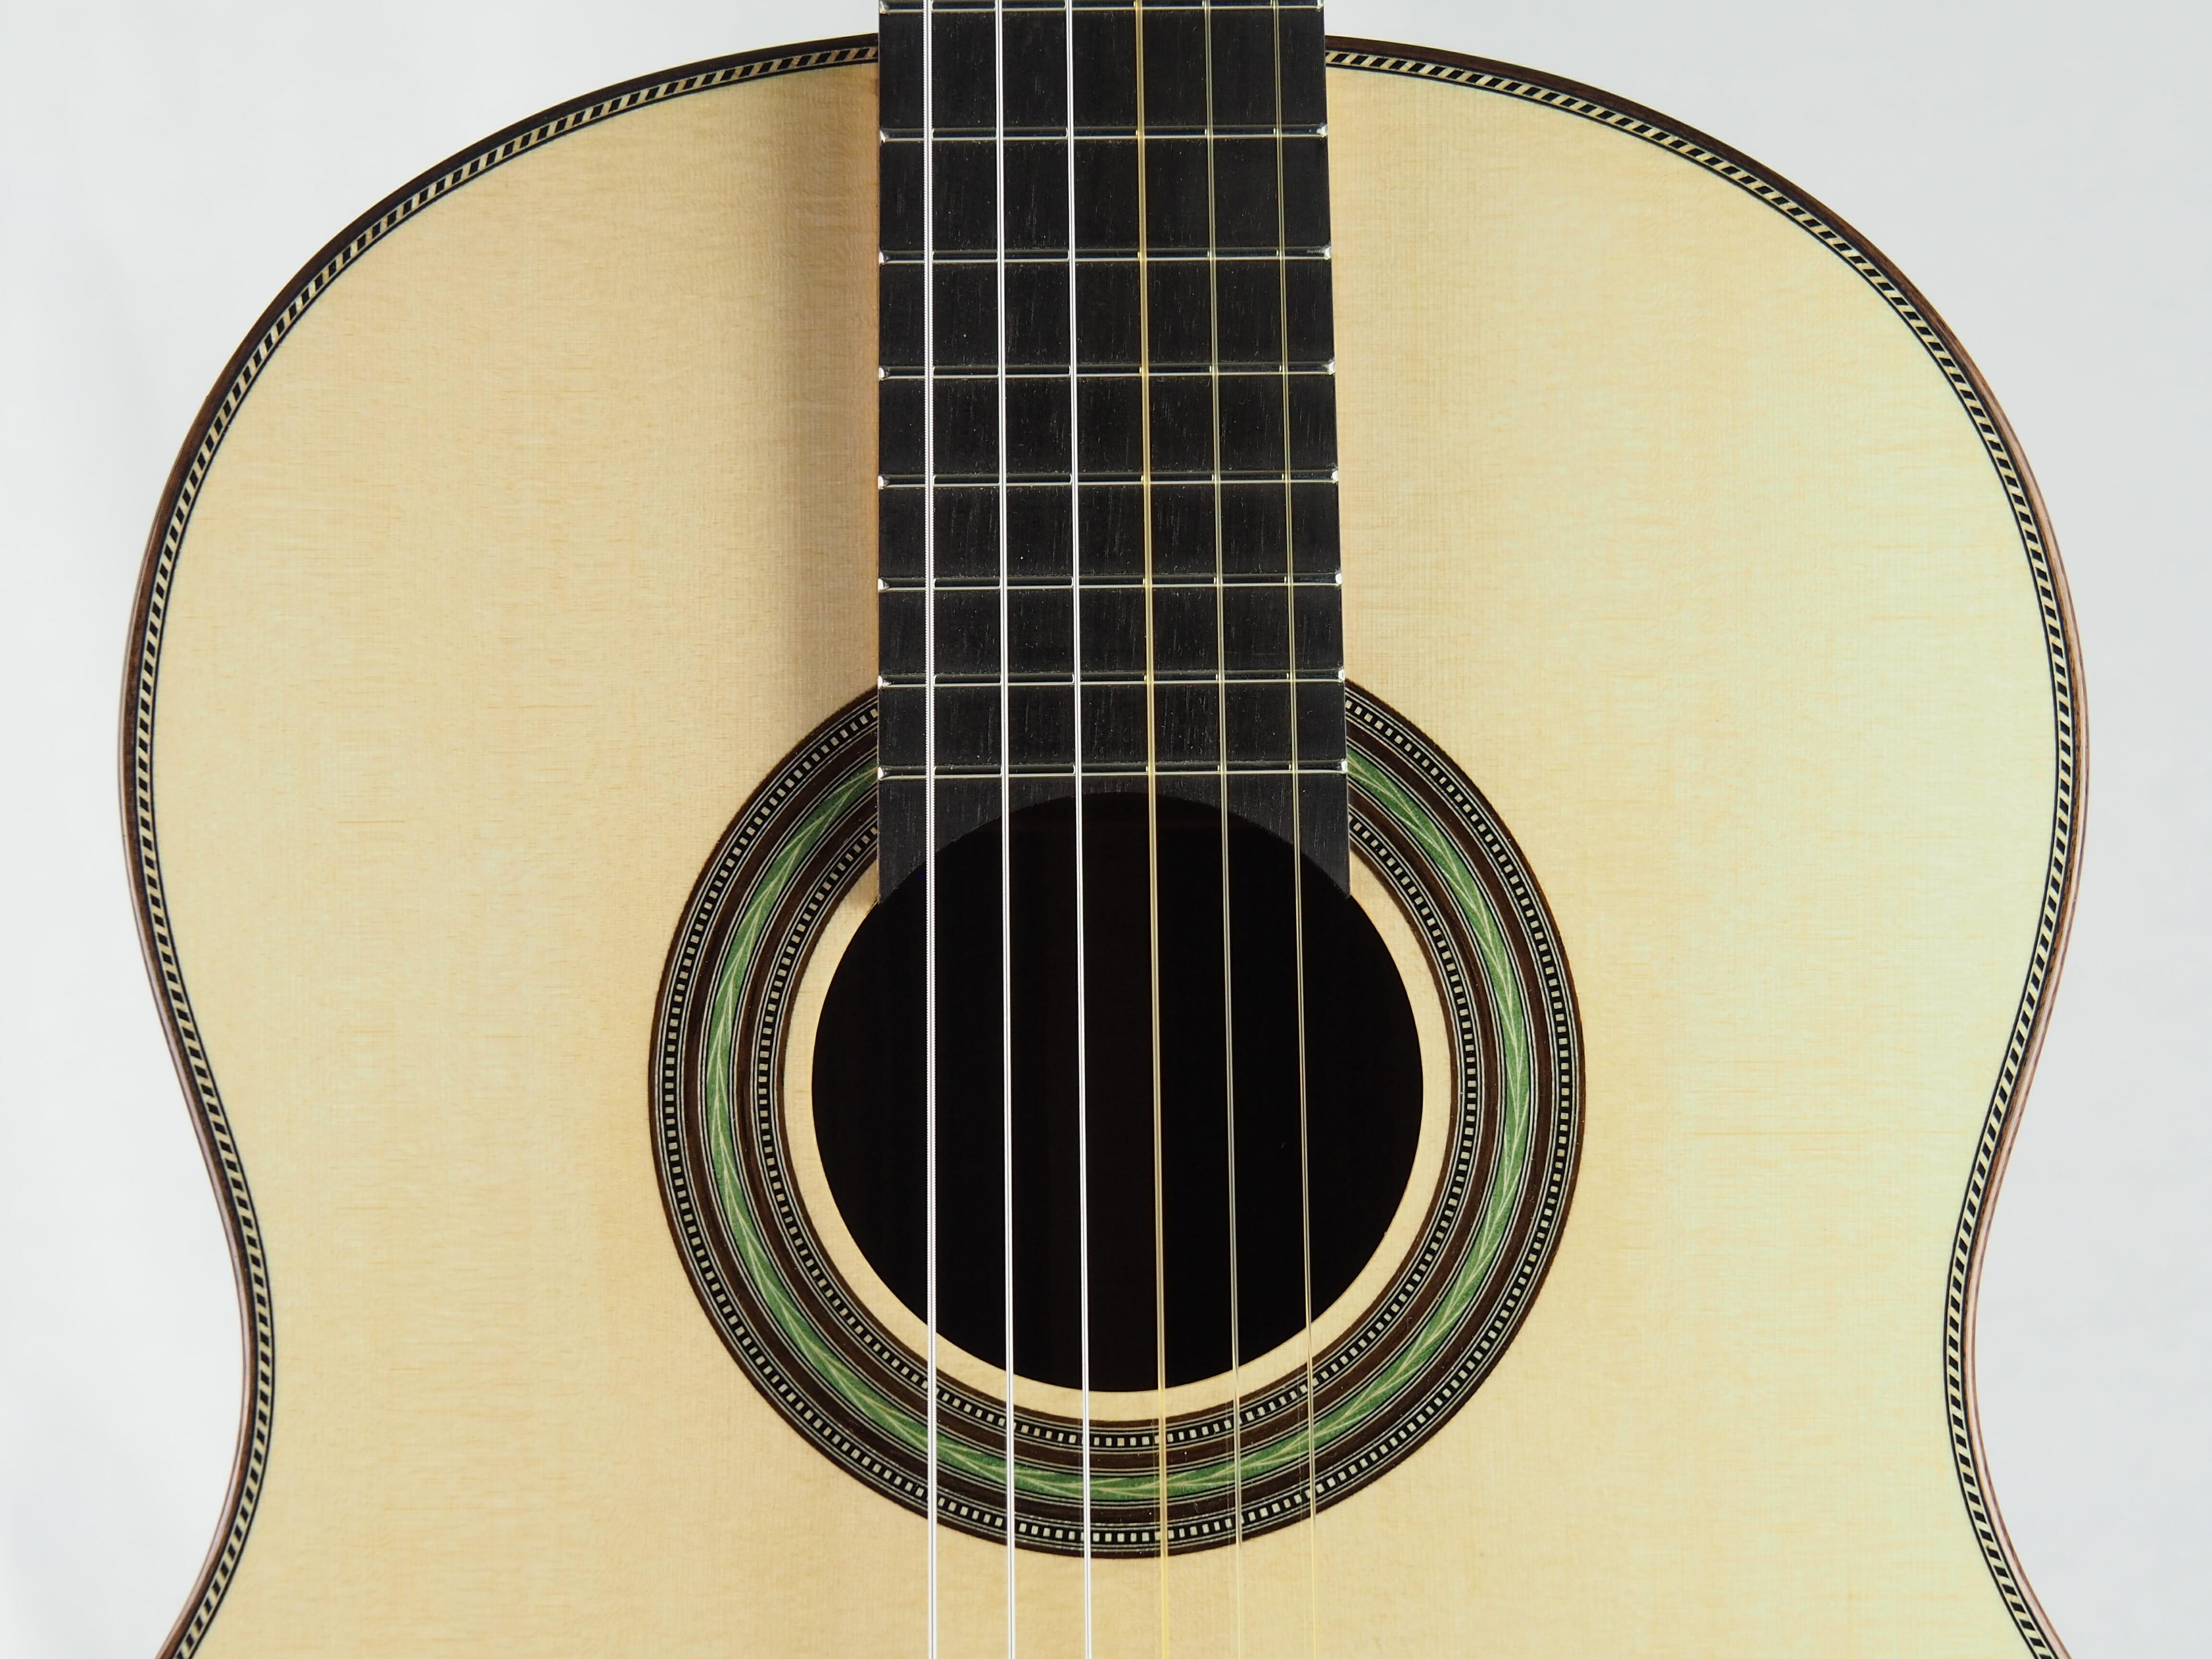 Stanislaw Partyka guitare classique de luthier barrage lattice